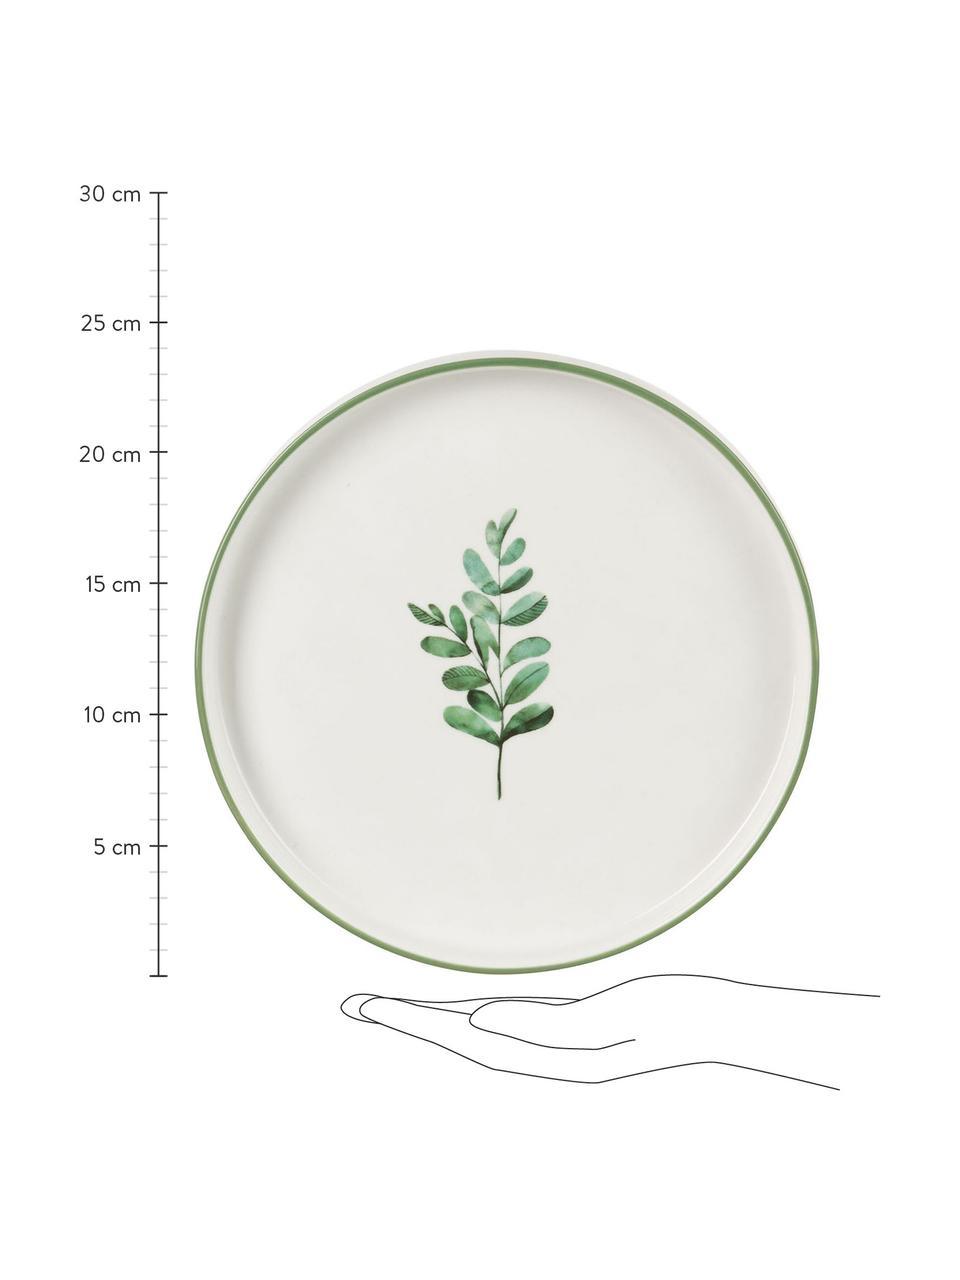 Piattino da dessert Eukalyptus 4 pz, New bone china, Bianco, verde, Ø 24 cm